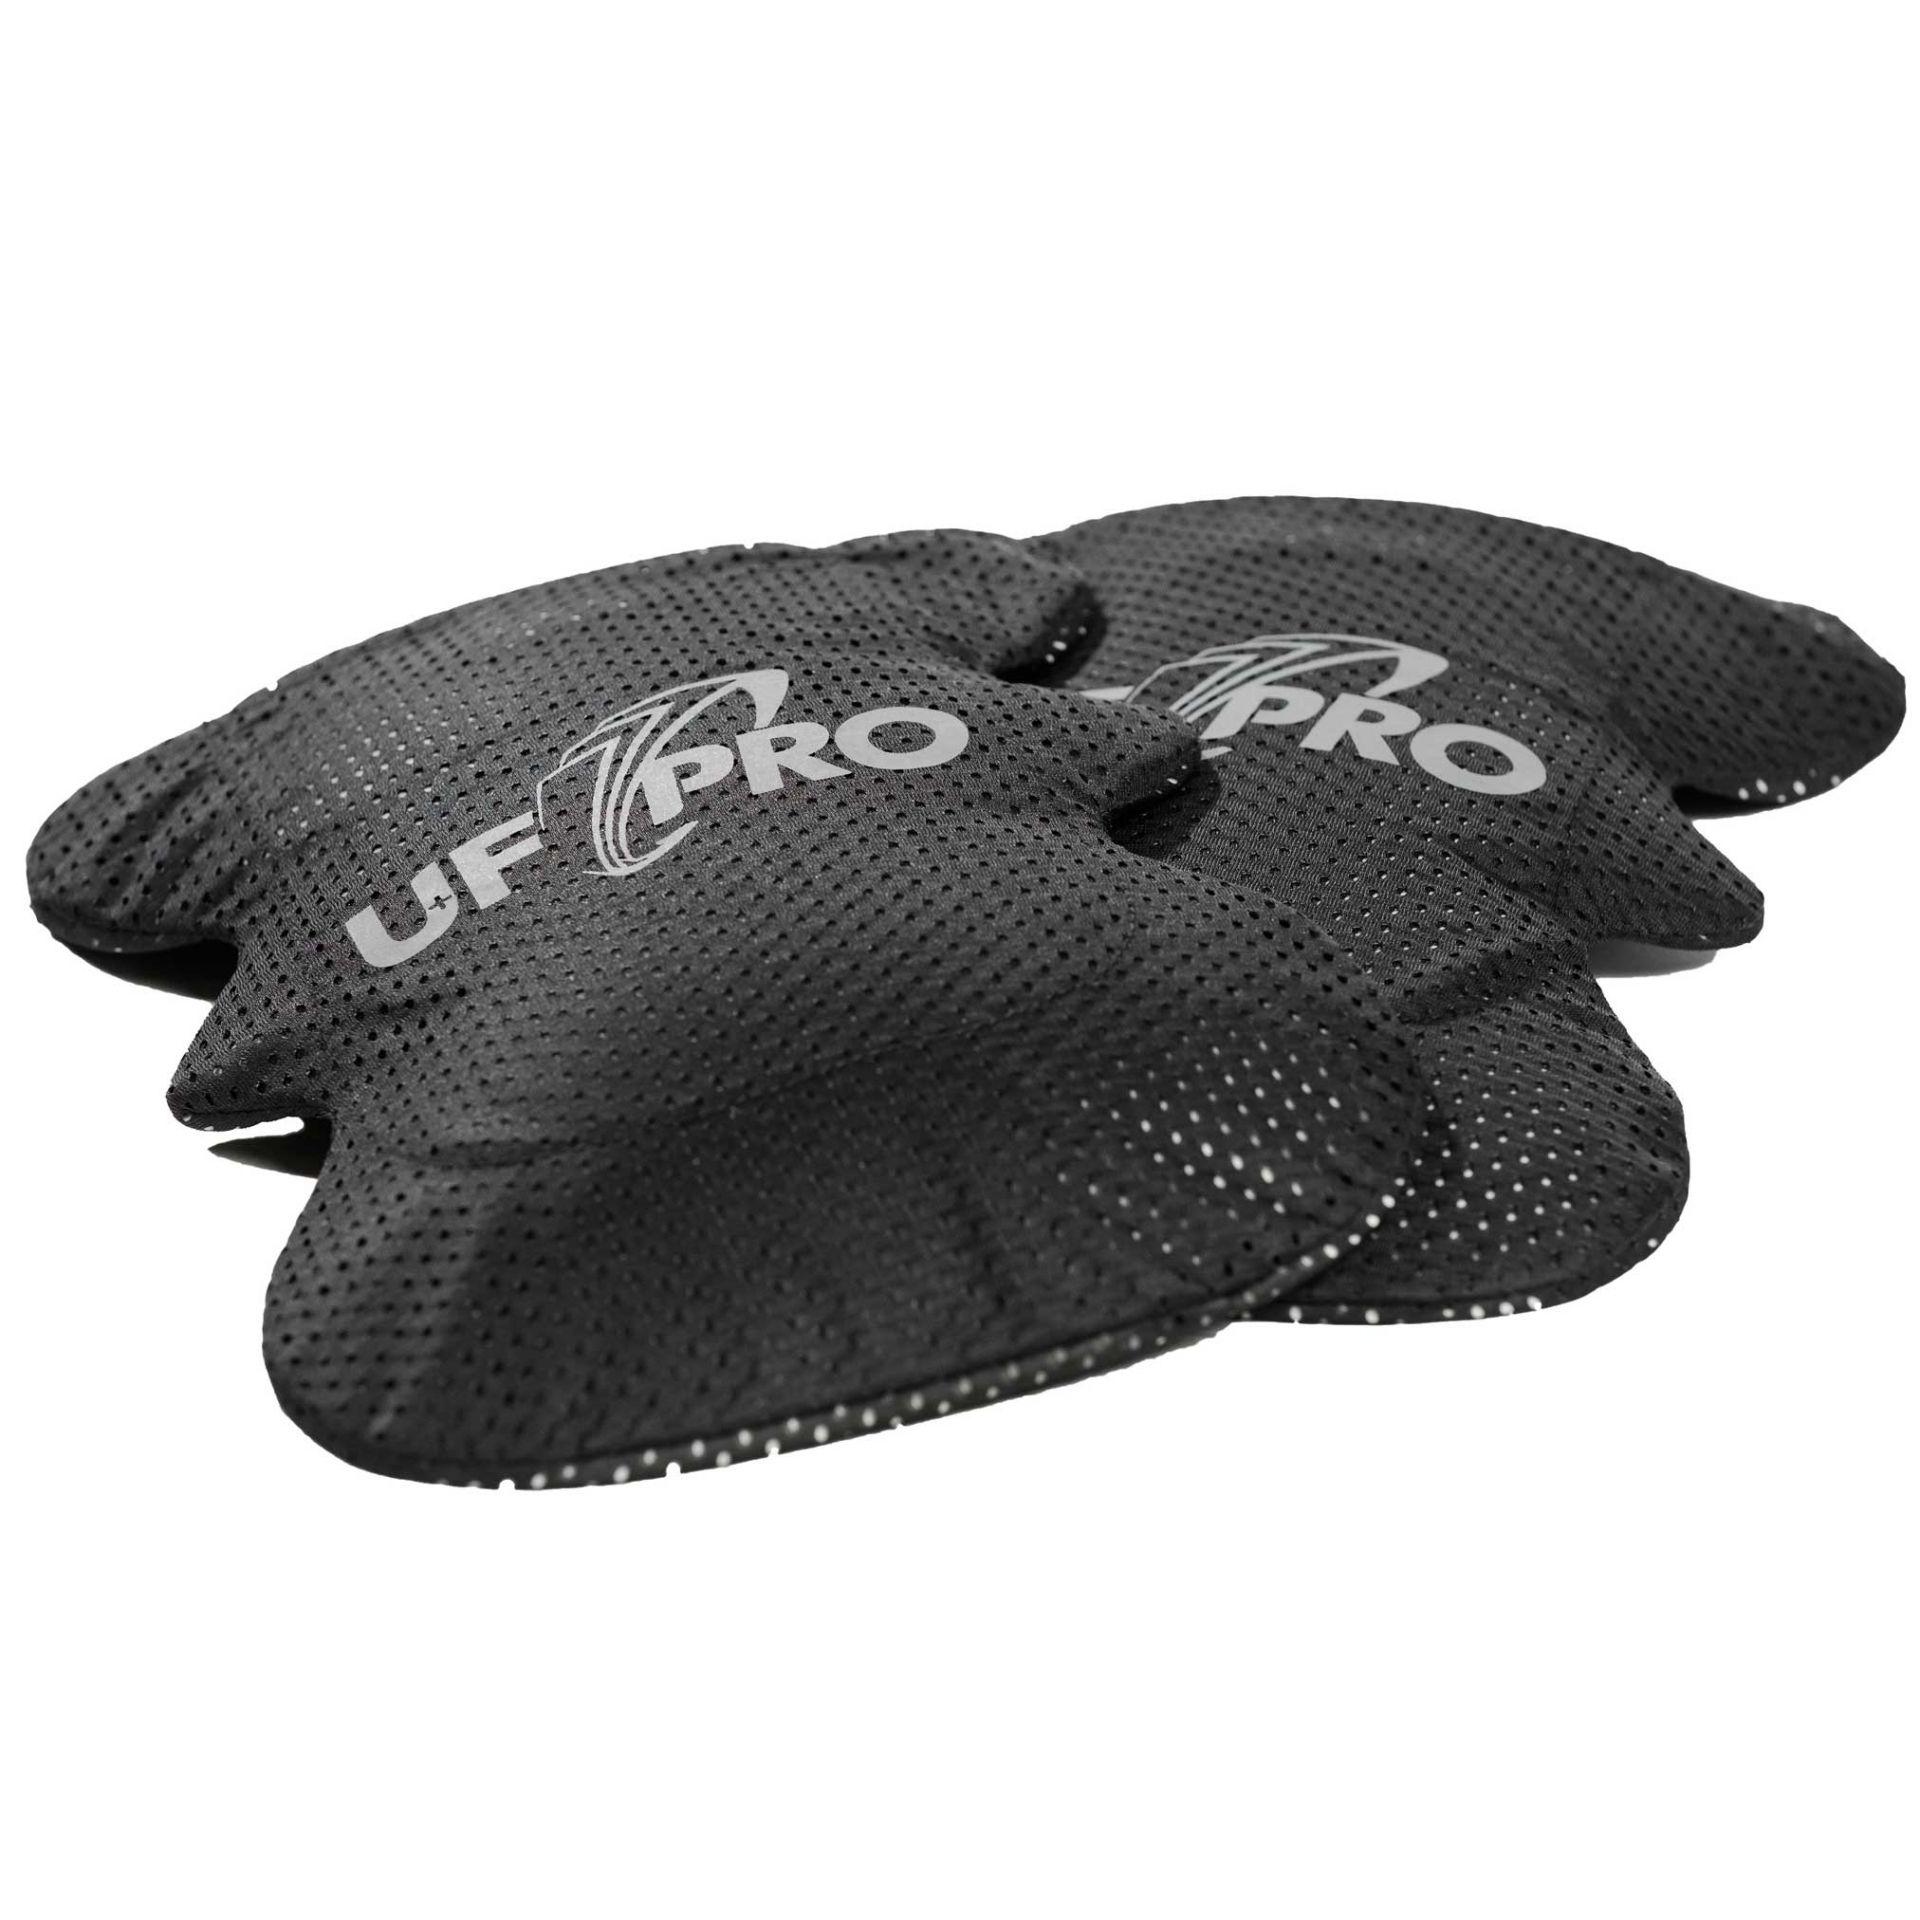 UF Pro Solid Pad Genouill/ère